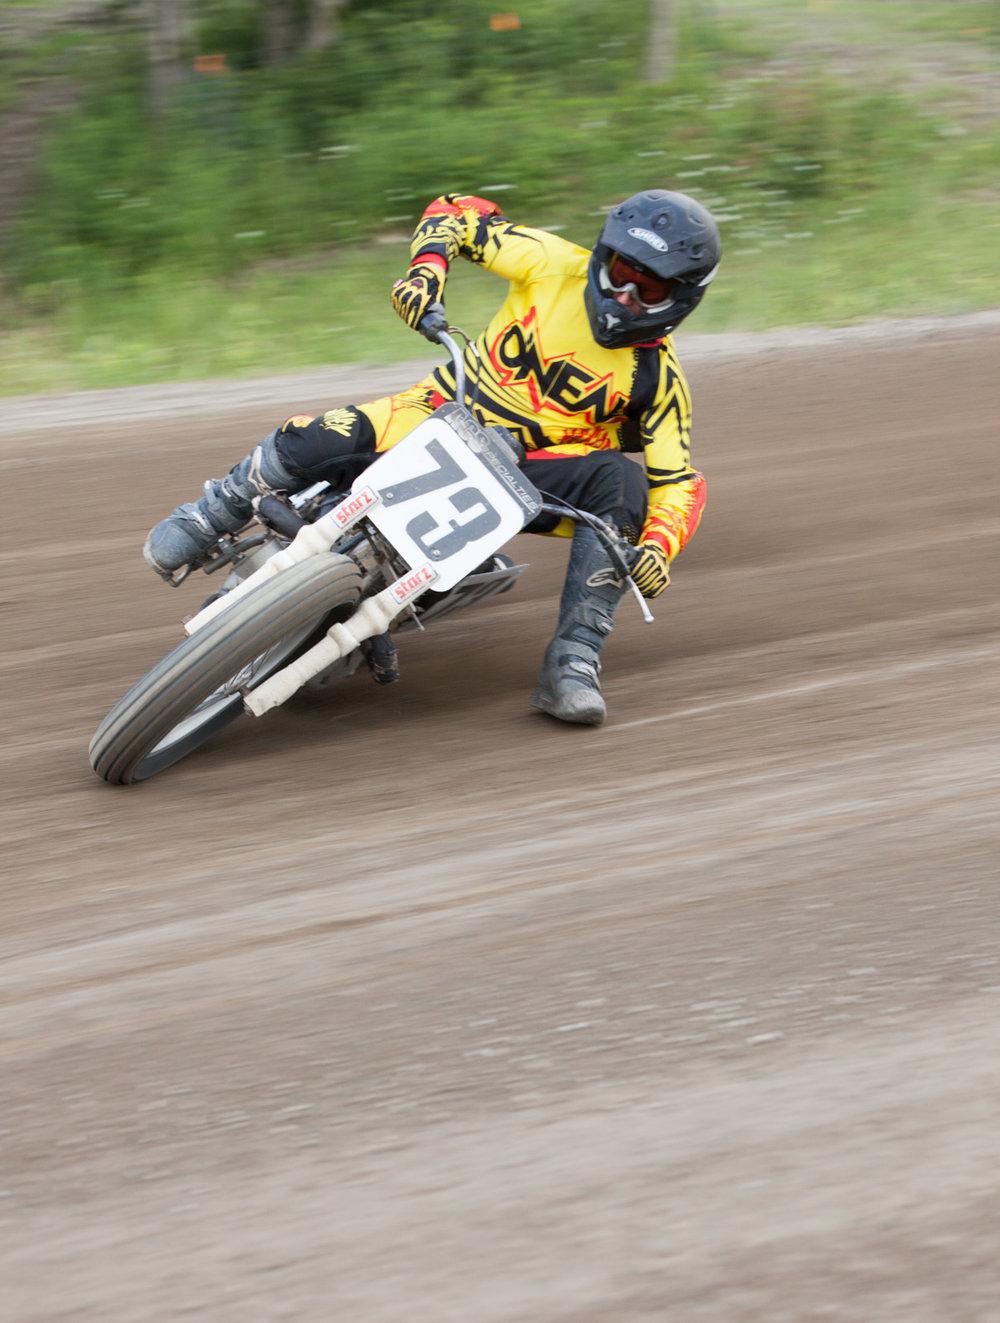 Dirt_Track_2013-06-28_6776.jpg